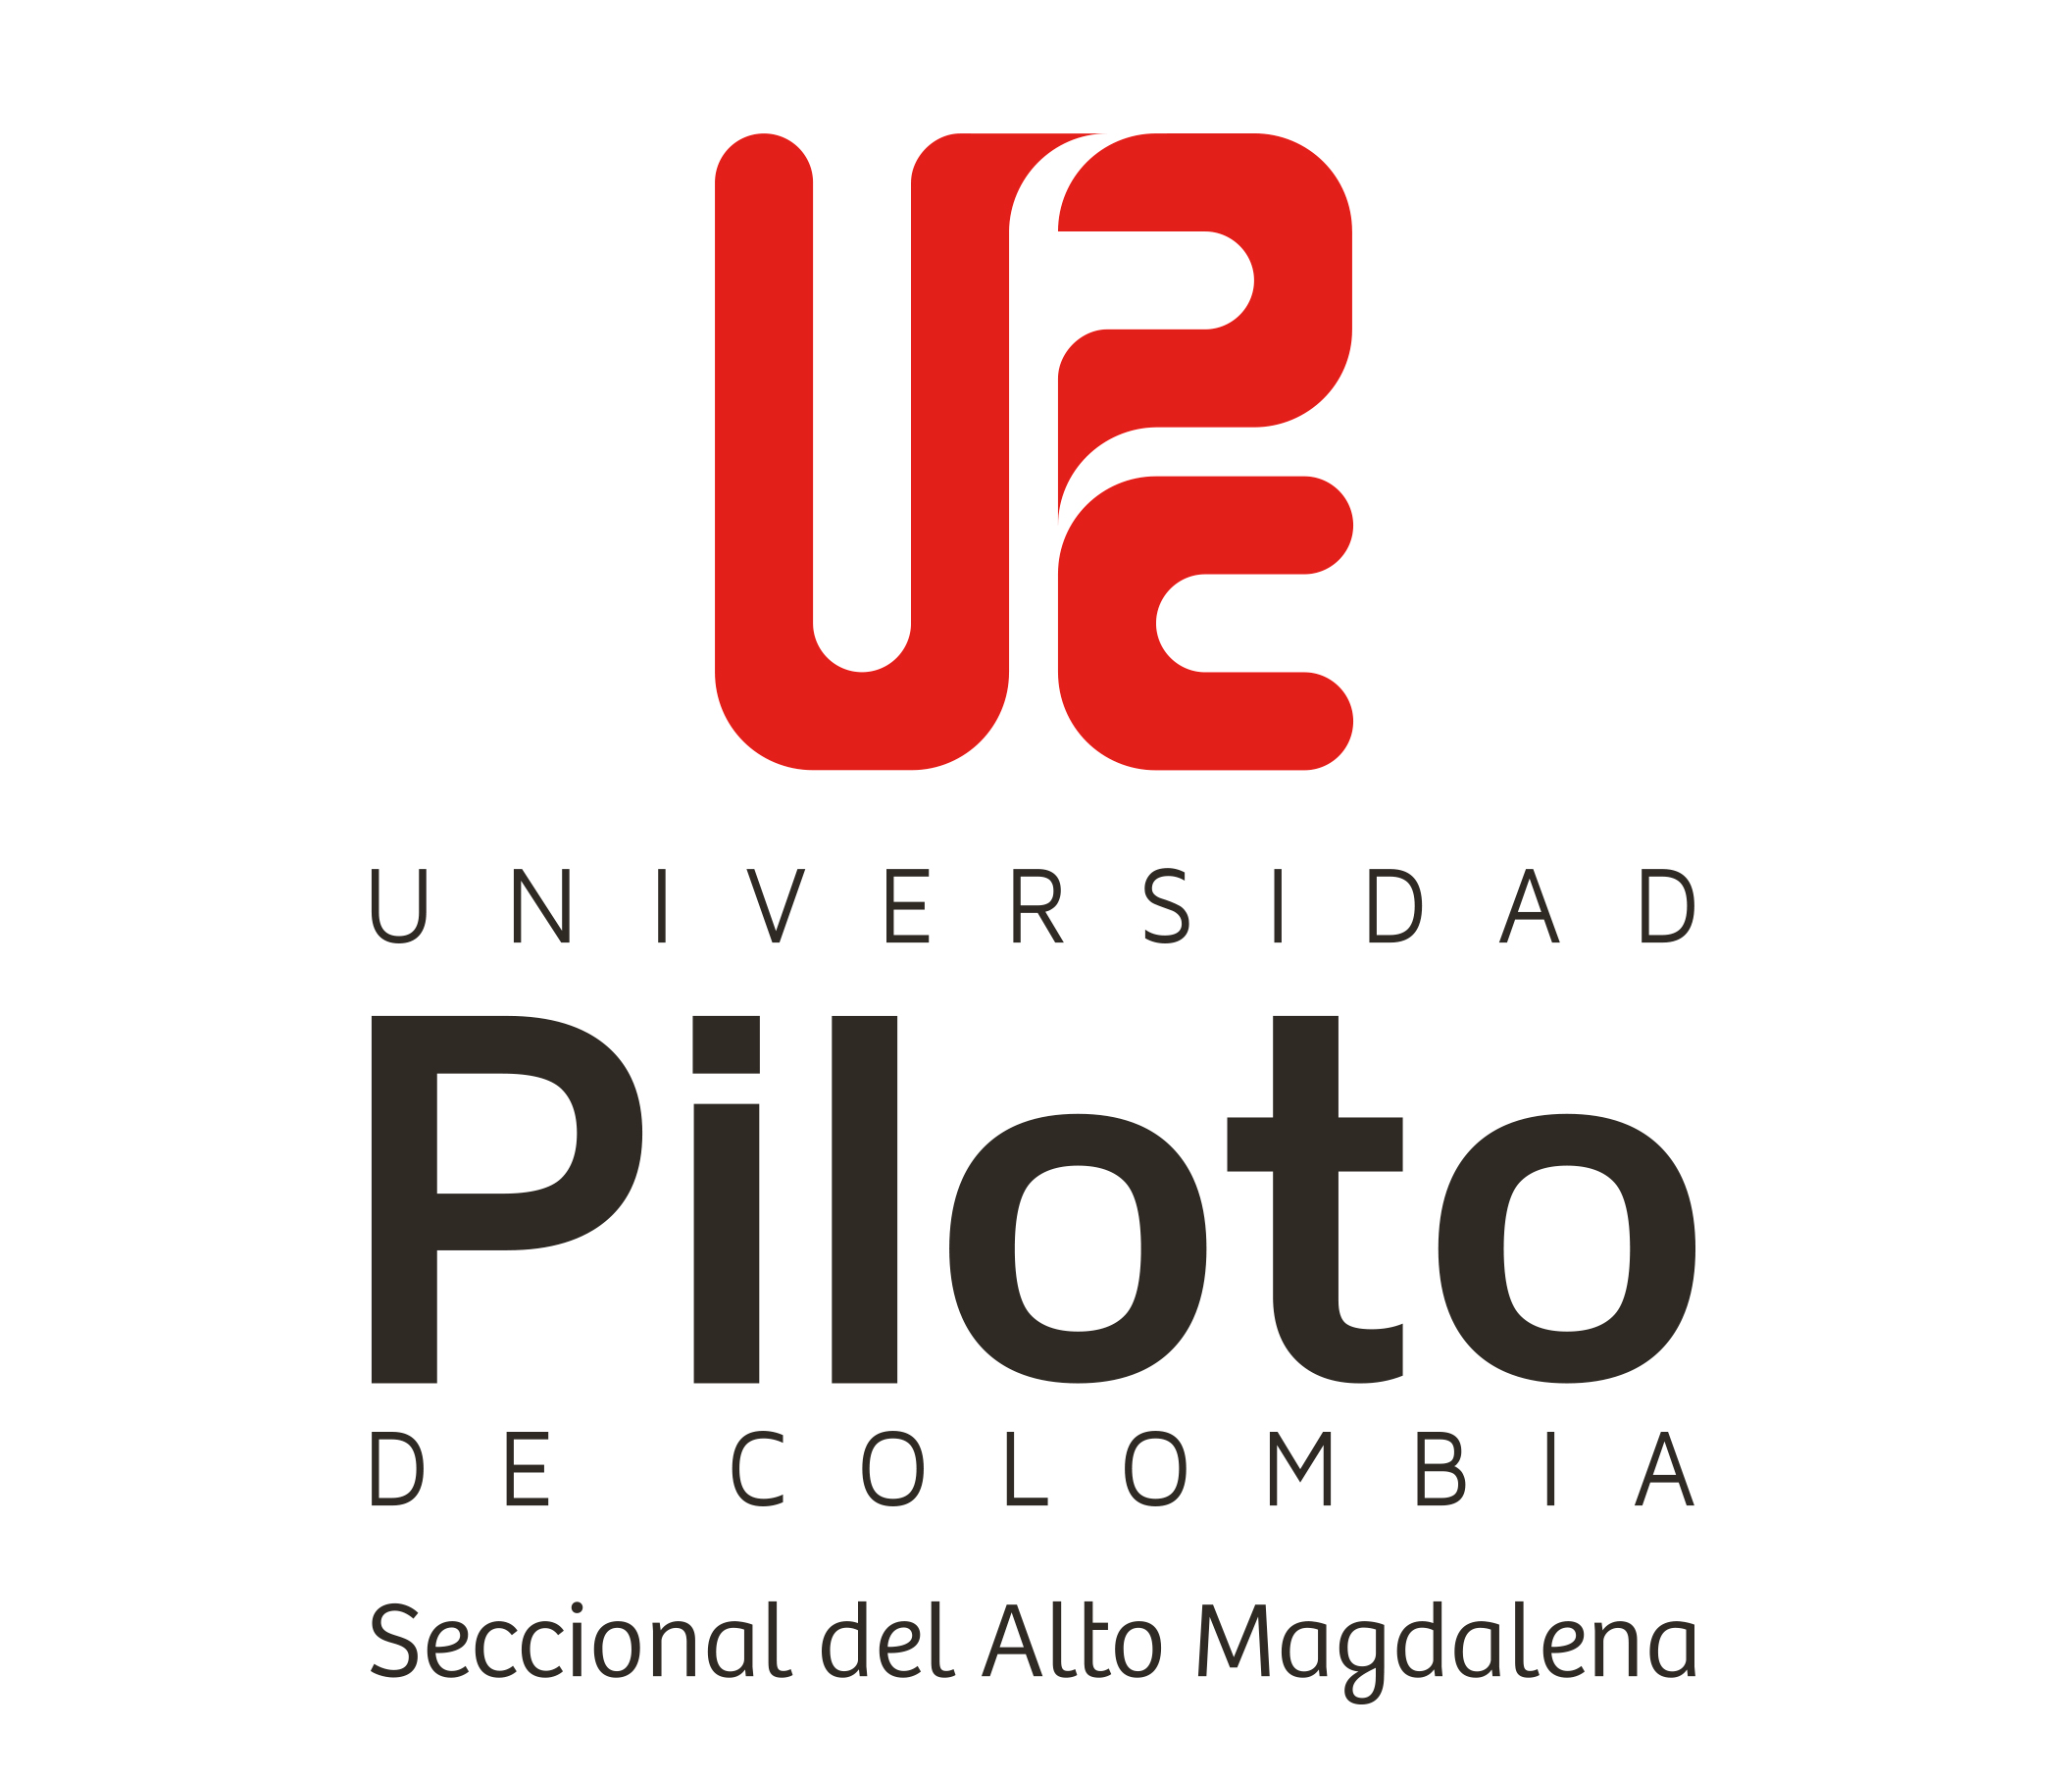 Universidad Piloto de Colombia - UNIPILOTO